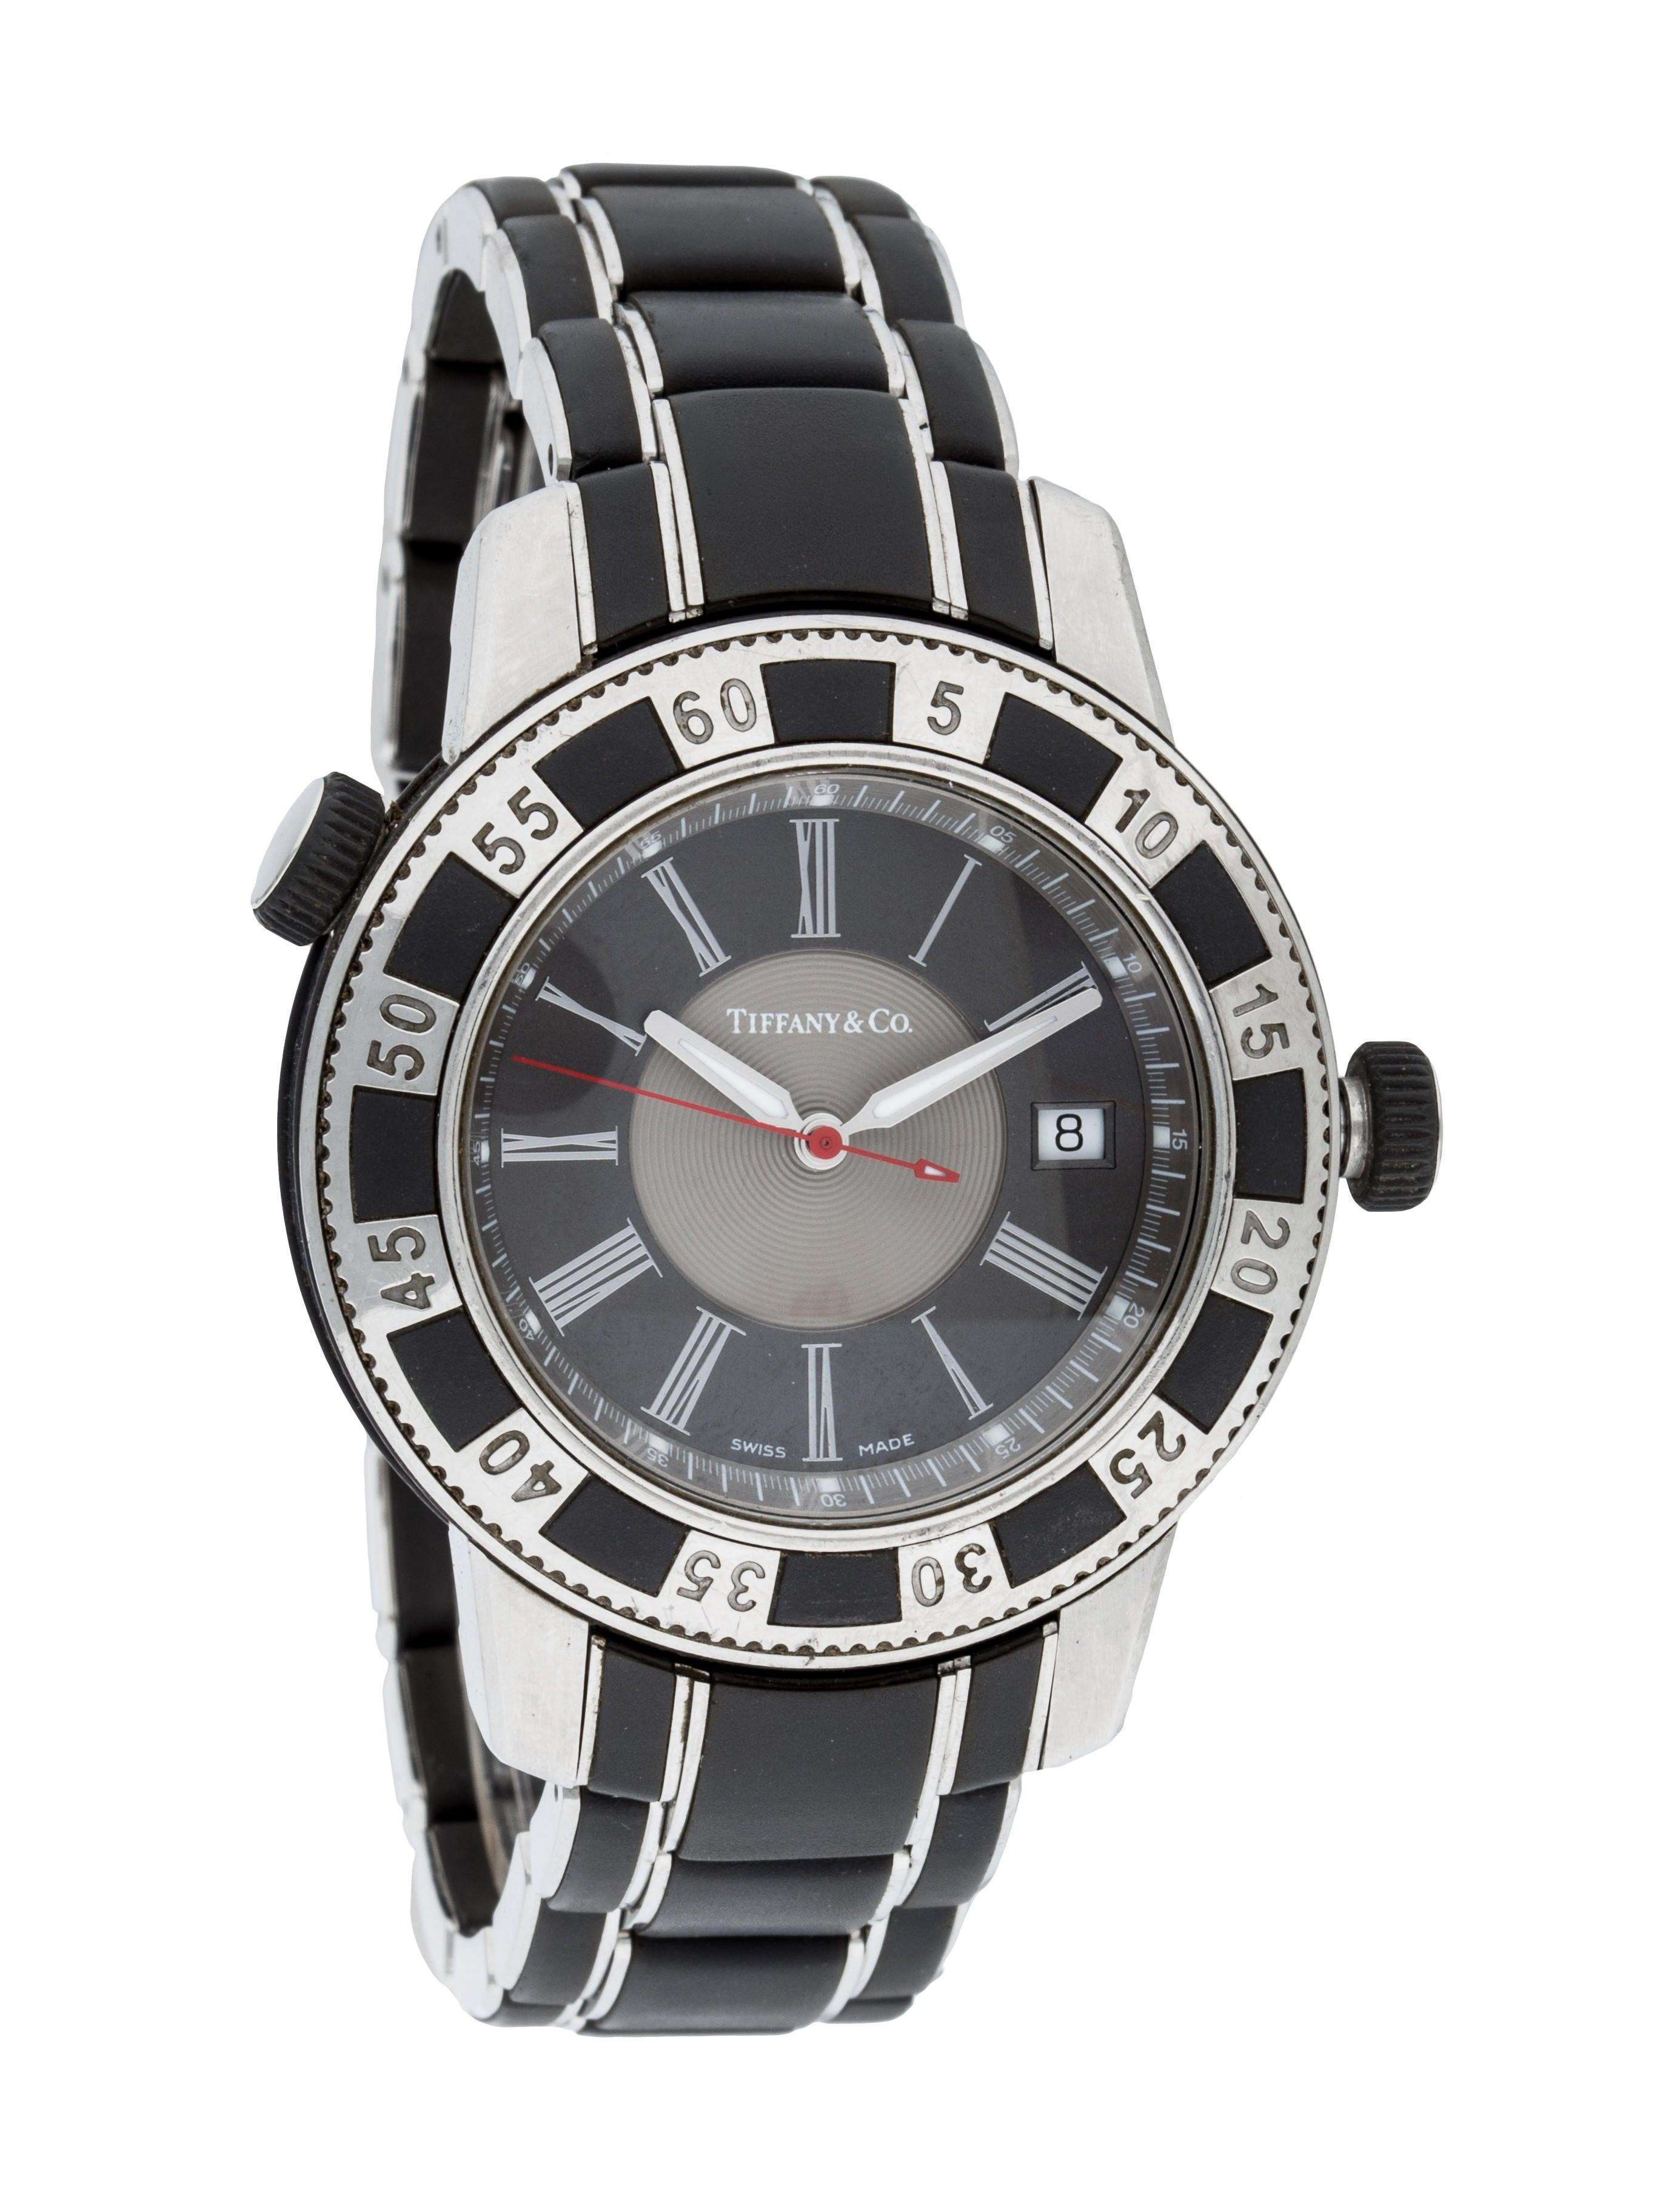 ddf52d9129bf5 Tiffany & Co. Mark T-57 Watch - Bracelet - TIF43032 | The RealReal